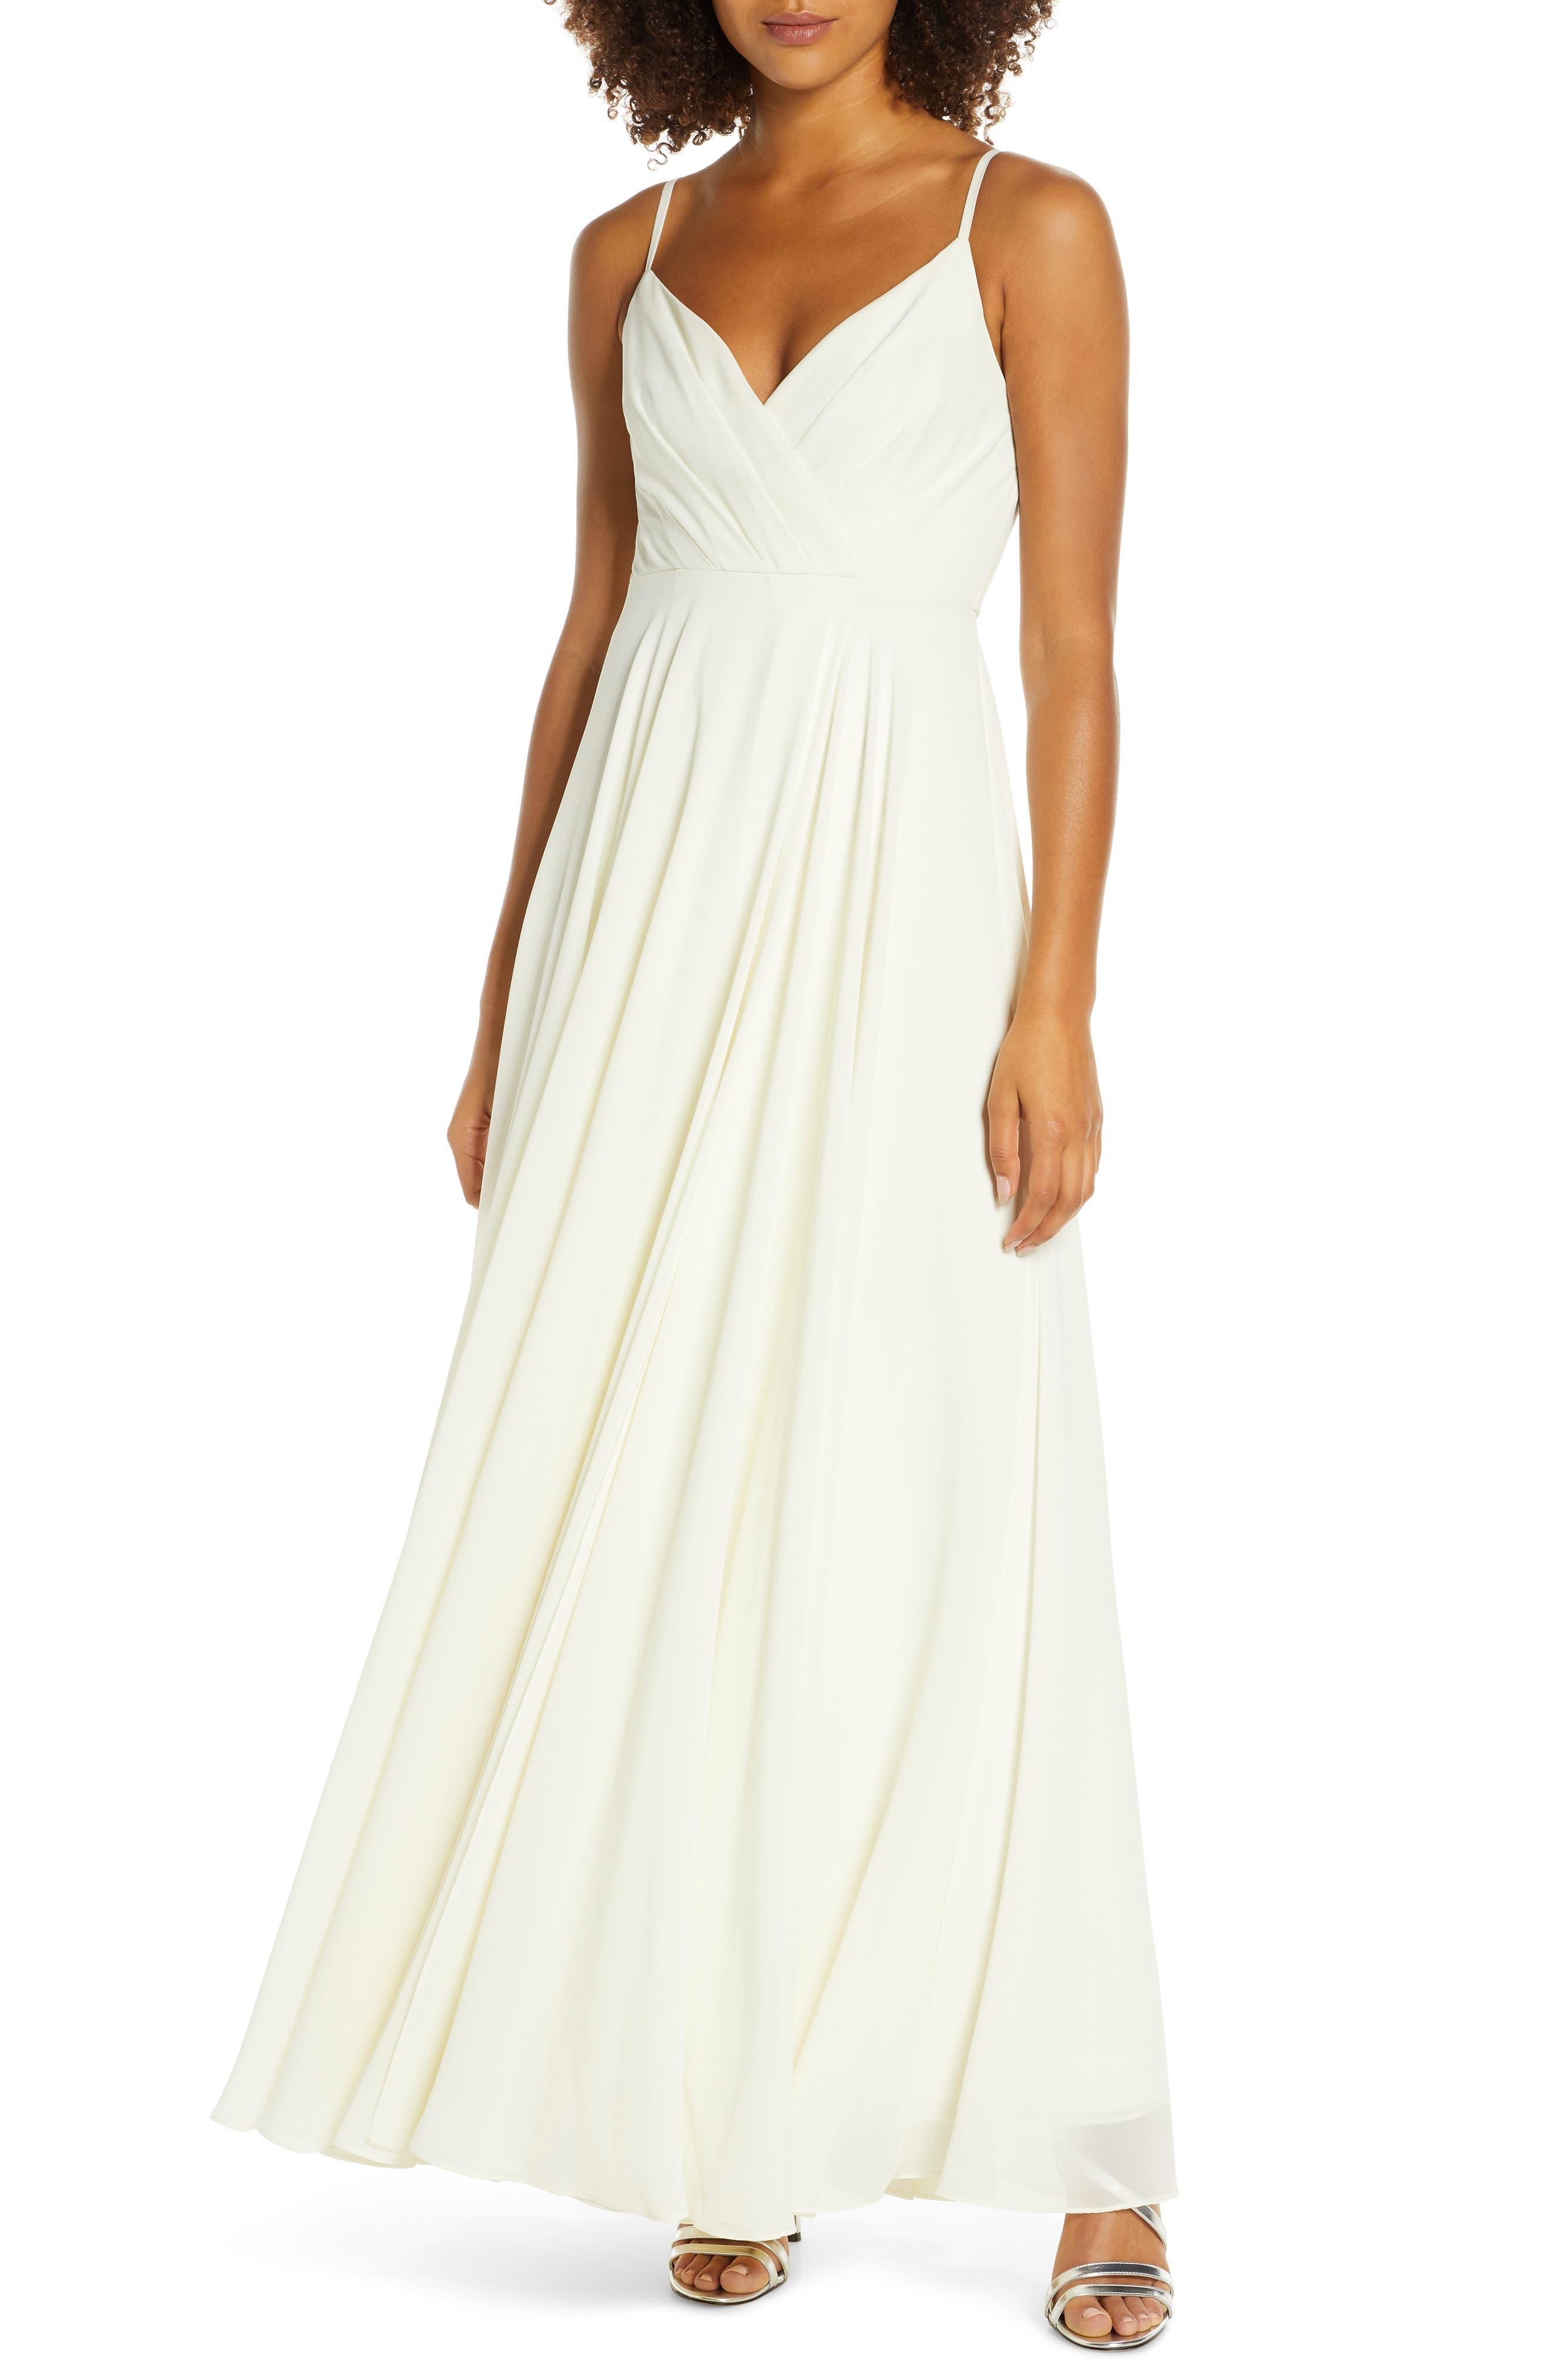 60s Wedding Dresses | 70s Wedding Dresses Womens Lulus Surplice Chiffon Gown Size X-Large - Ivory $97.00 AT vintagedancer.com